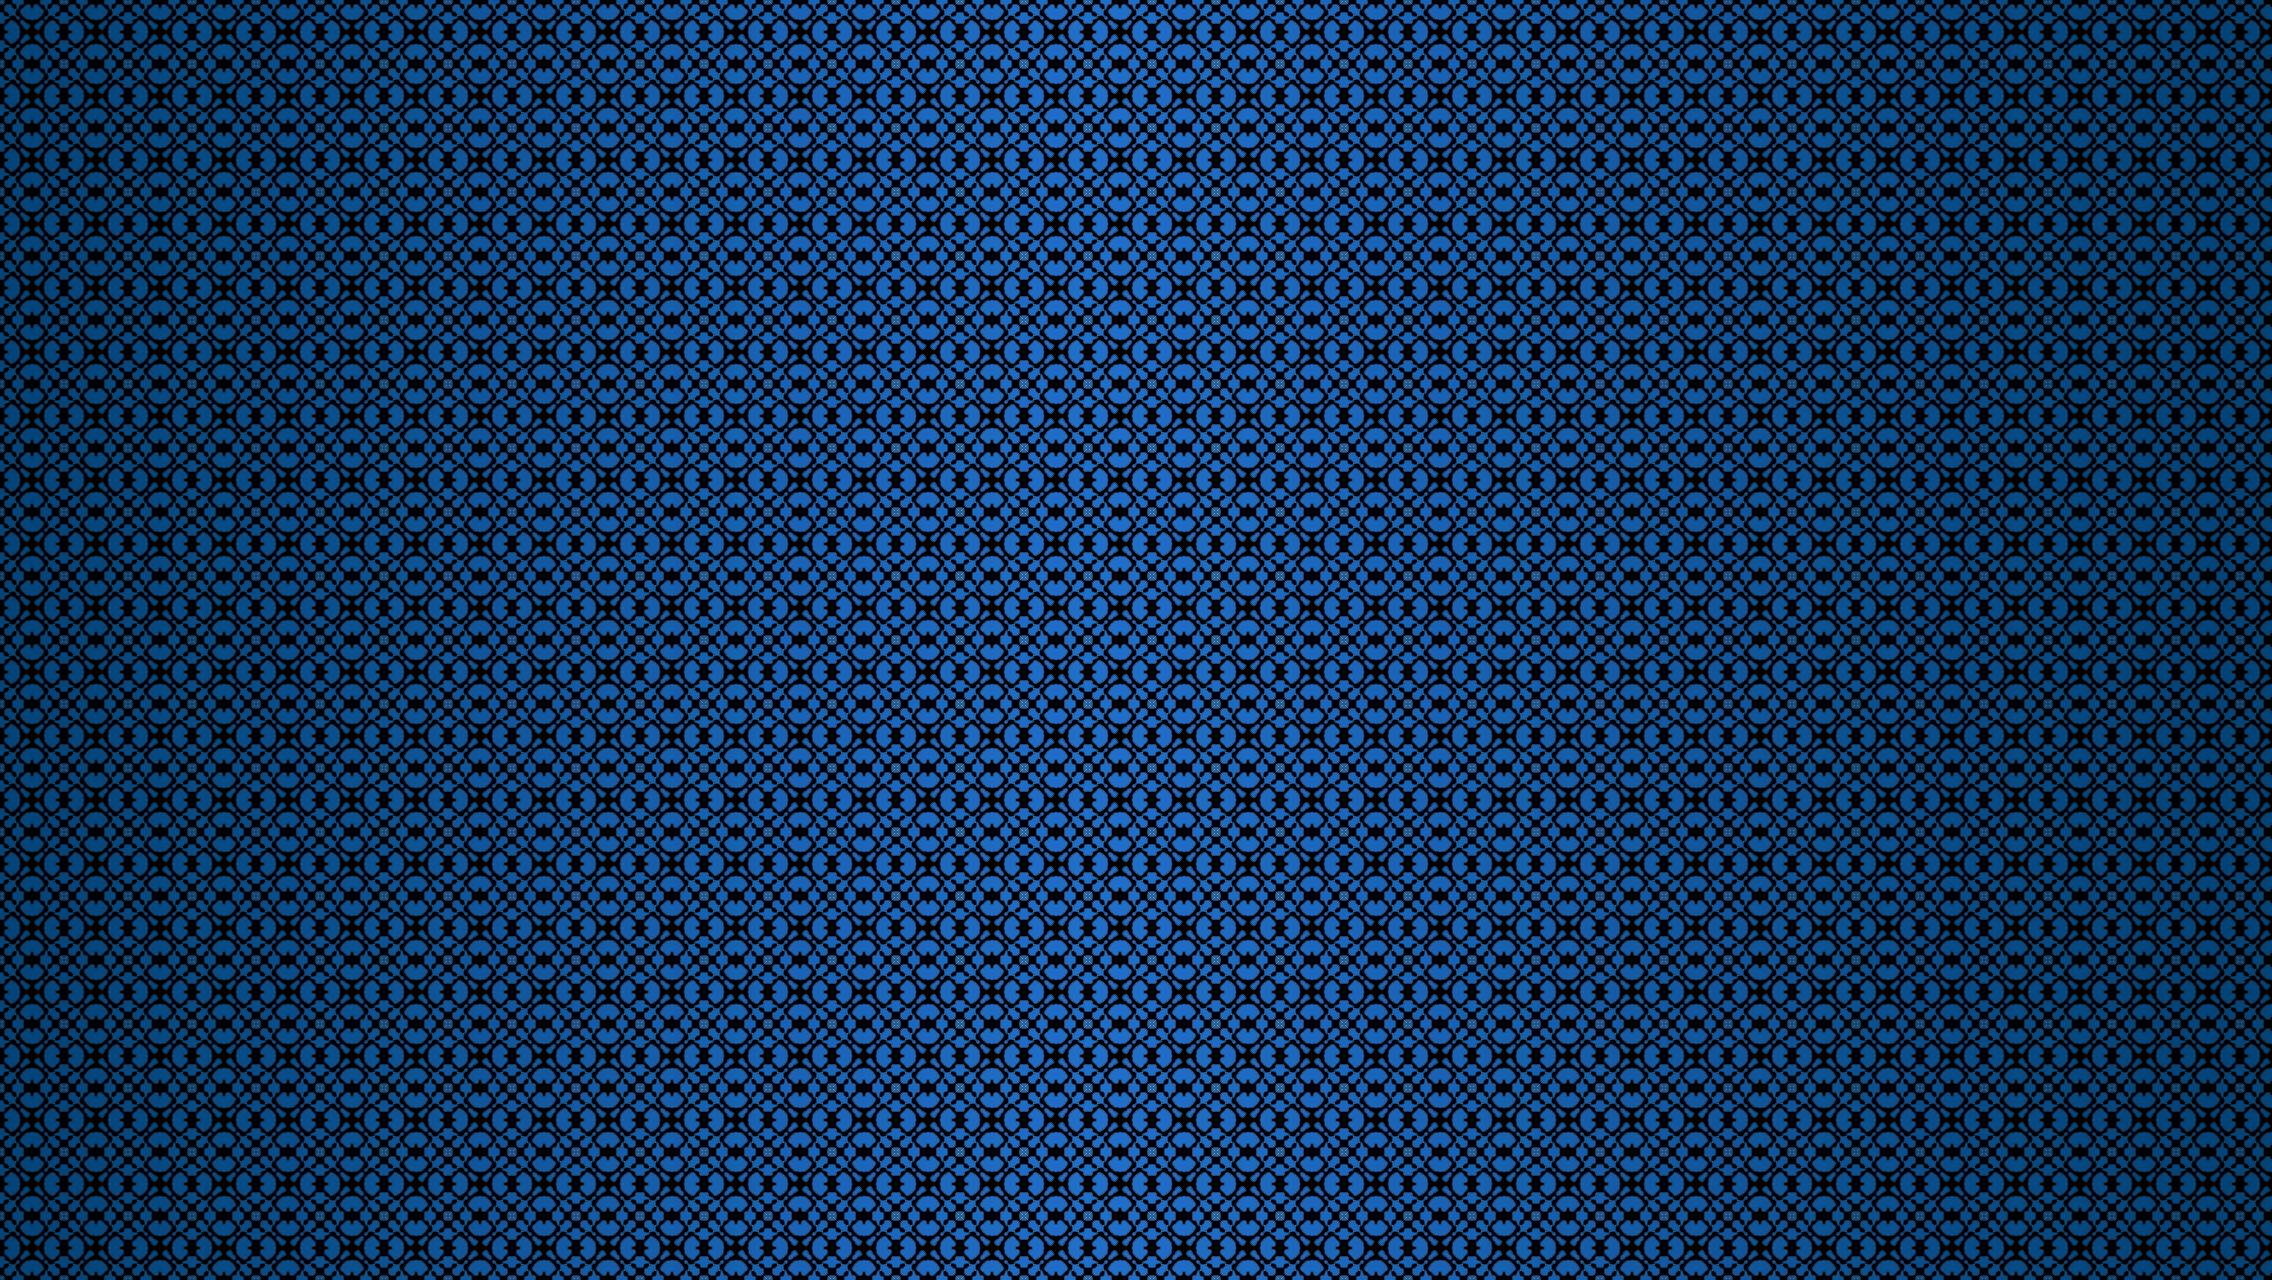 Blue Wallpaper Computer Wallpapers Desktop Backgrounds